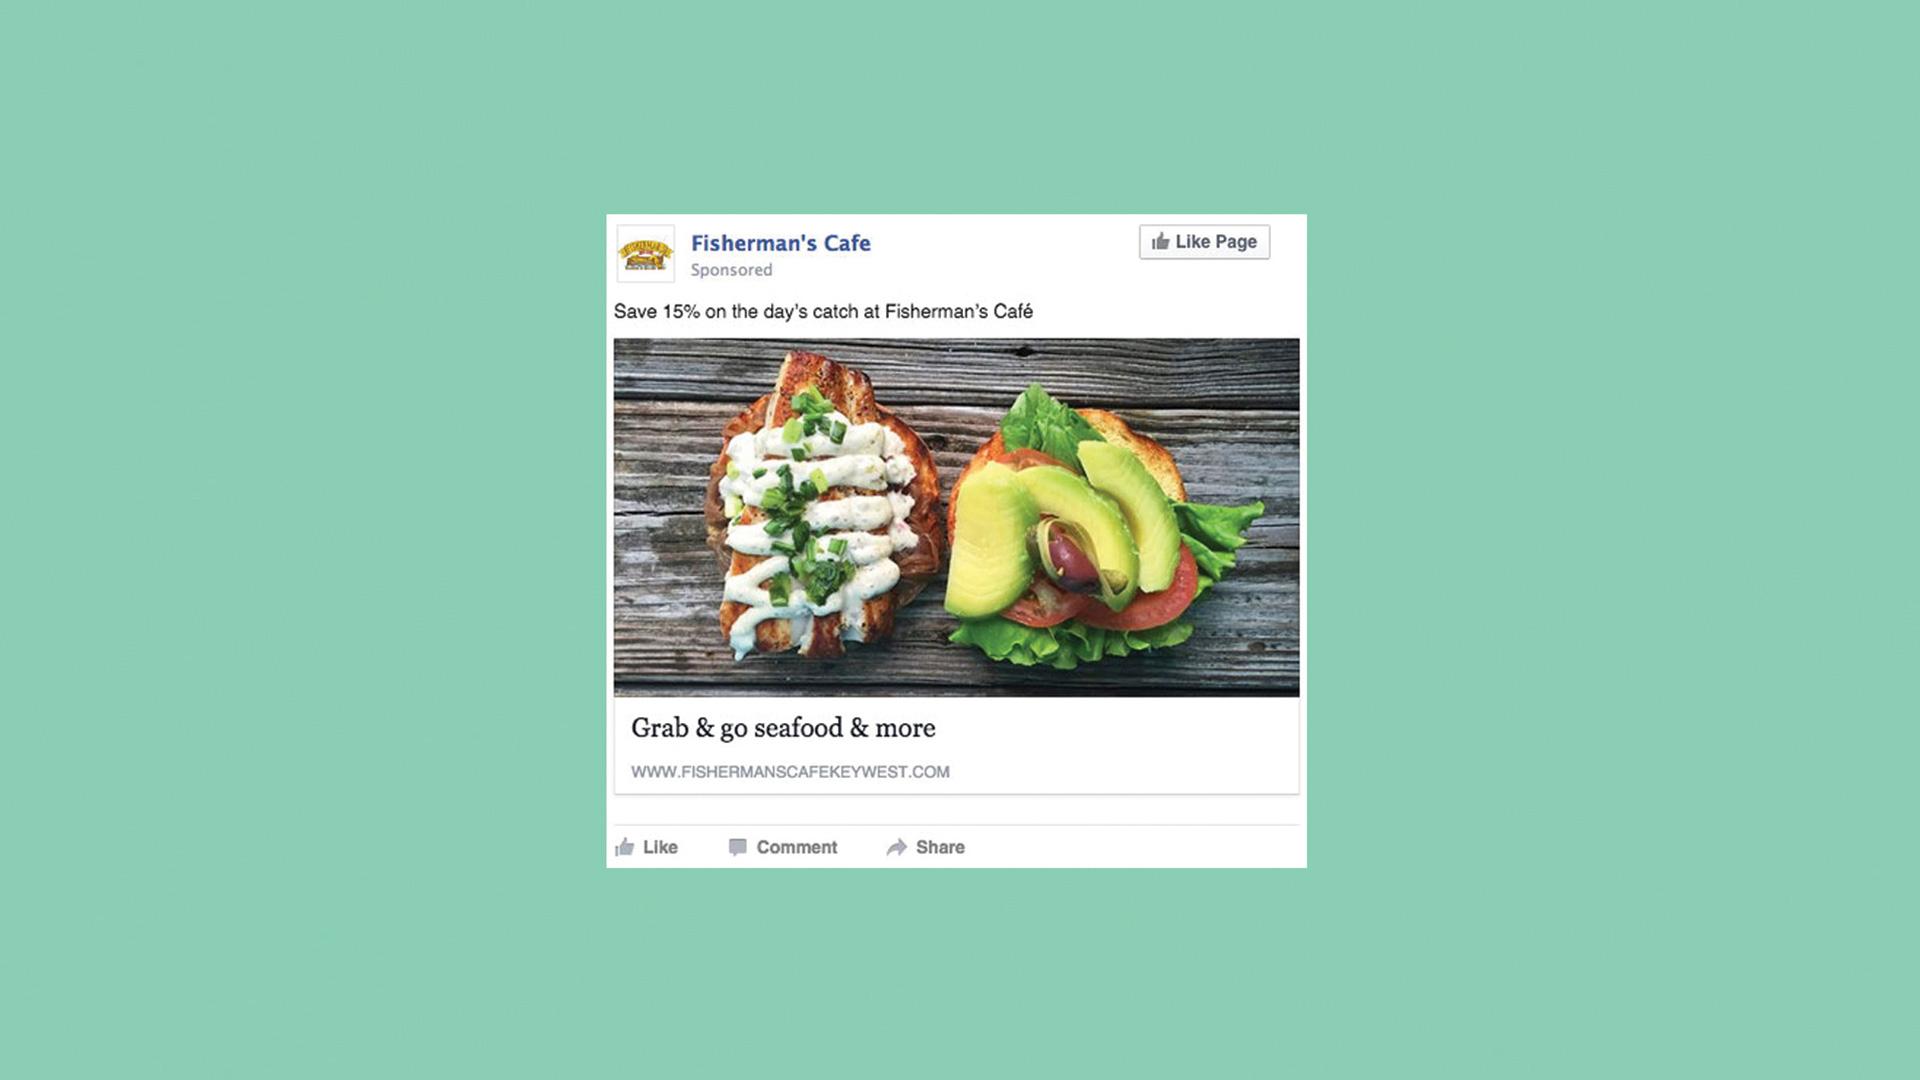 Fisherman's Cafe dish Facebook post